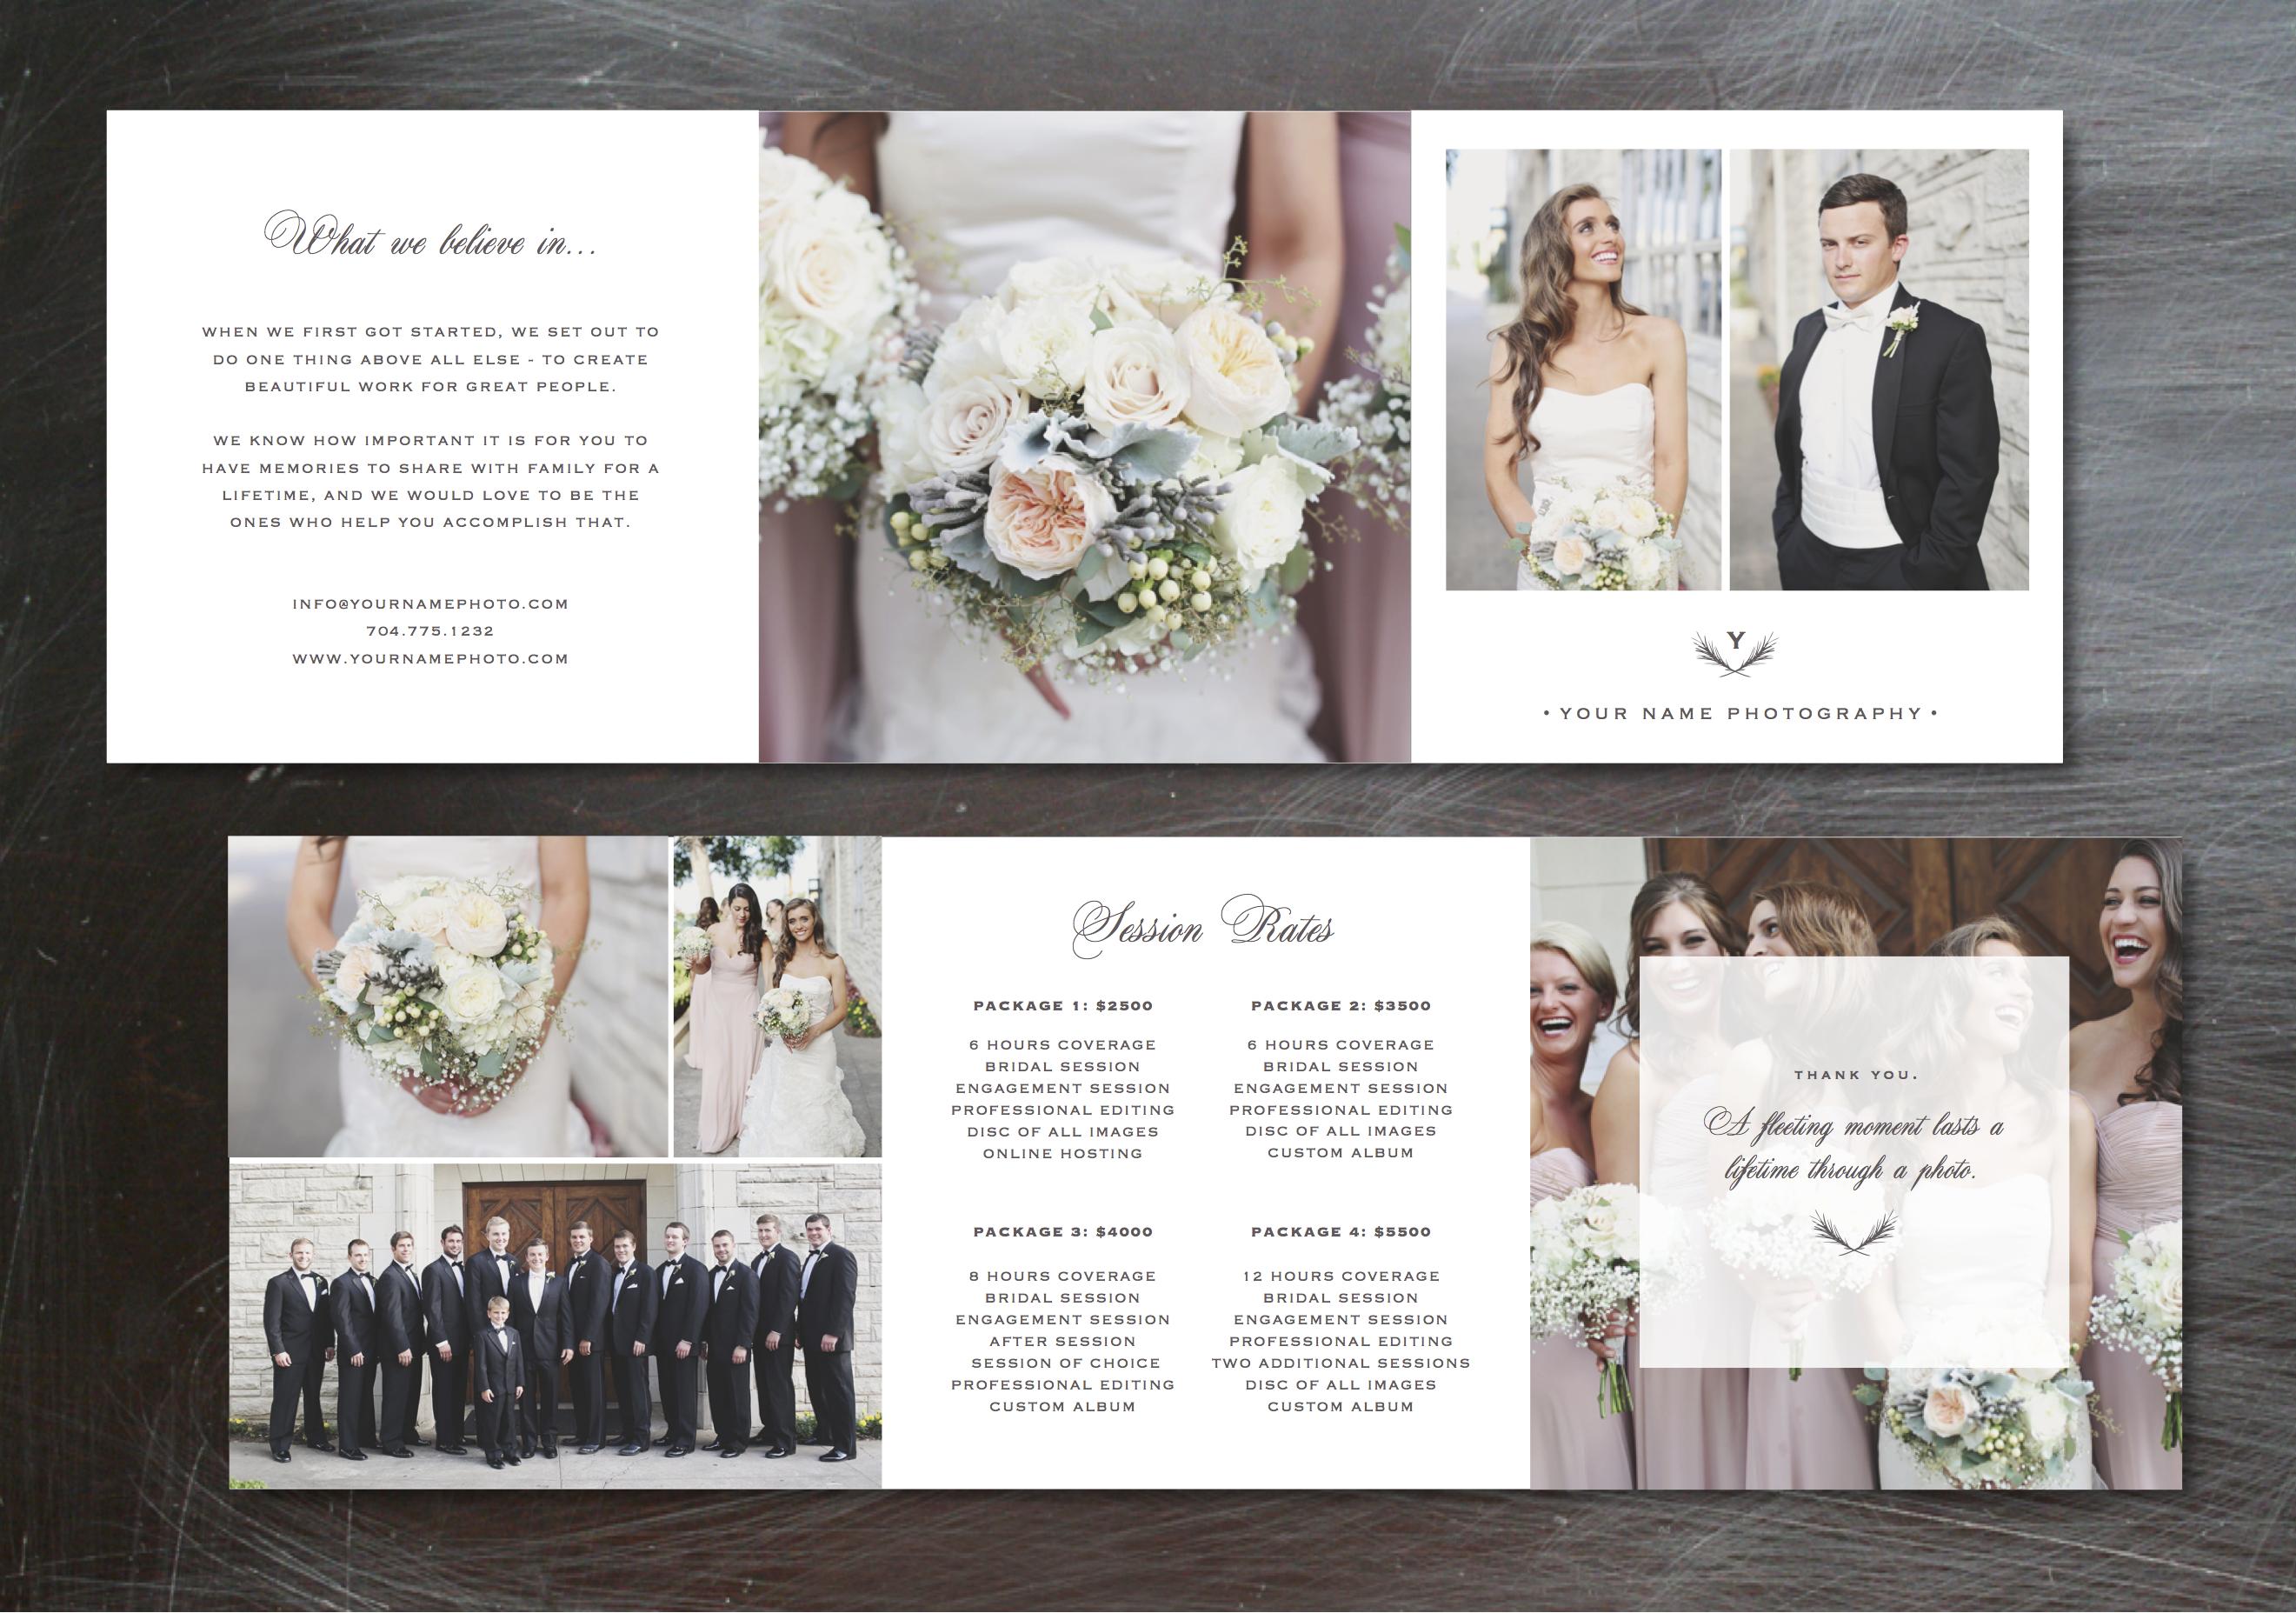 Wedding Photography Marketing Templates   Template, Photographers ...